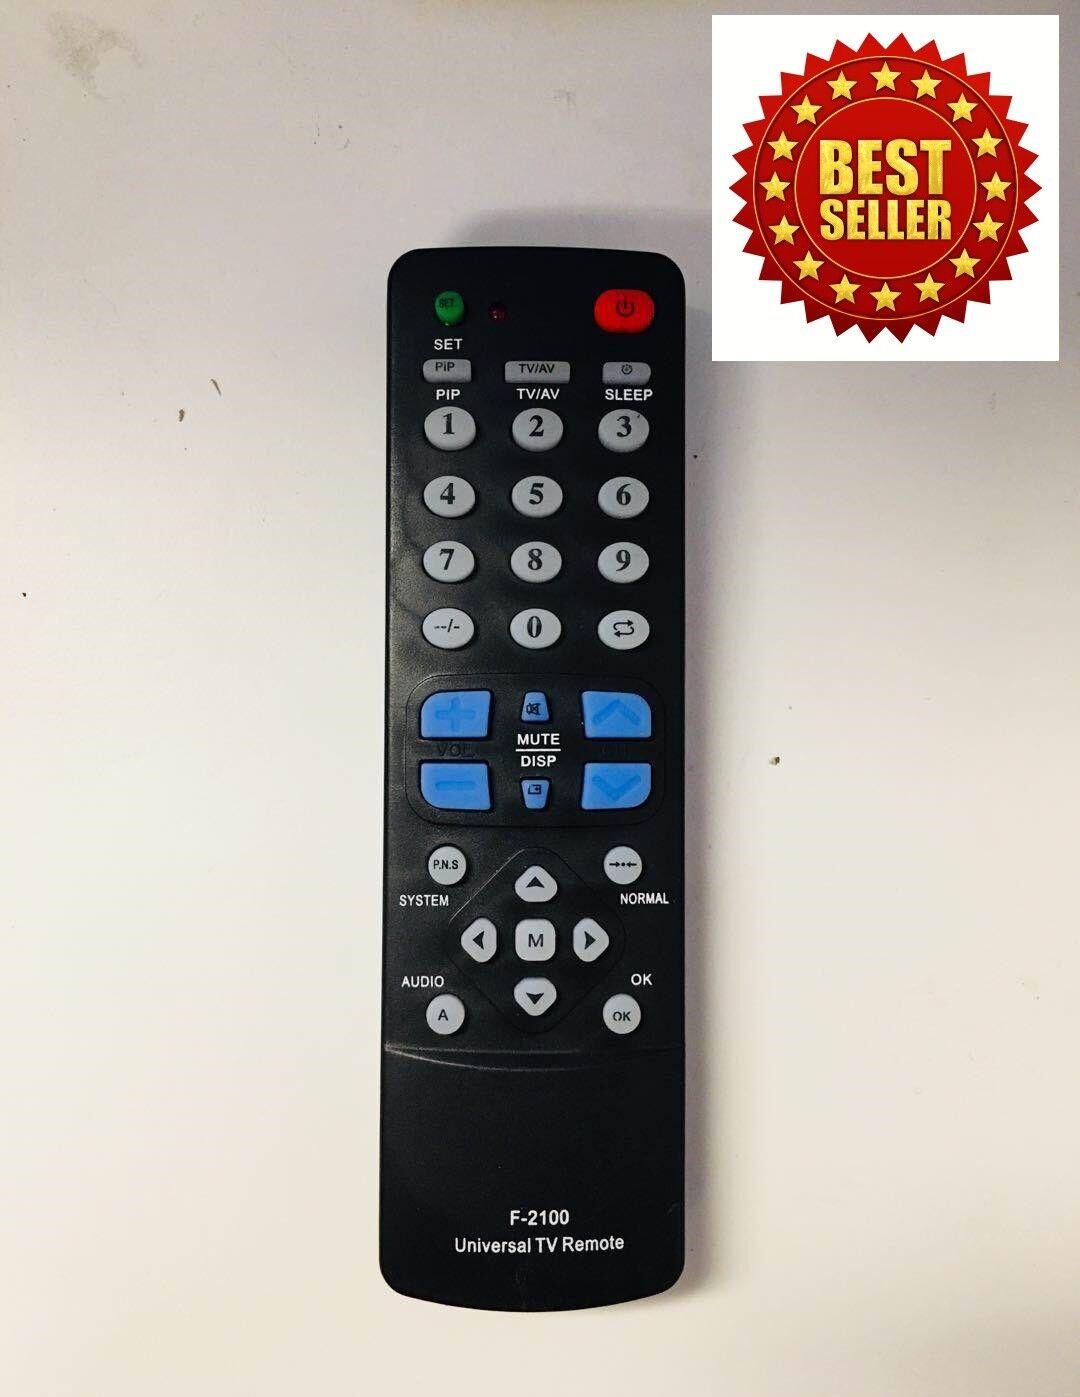 BRAND NEW UNIVERSAL Remote Control 3 Device TV VCR DVD